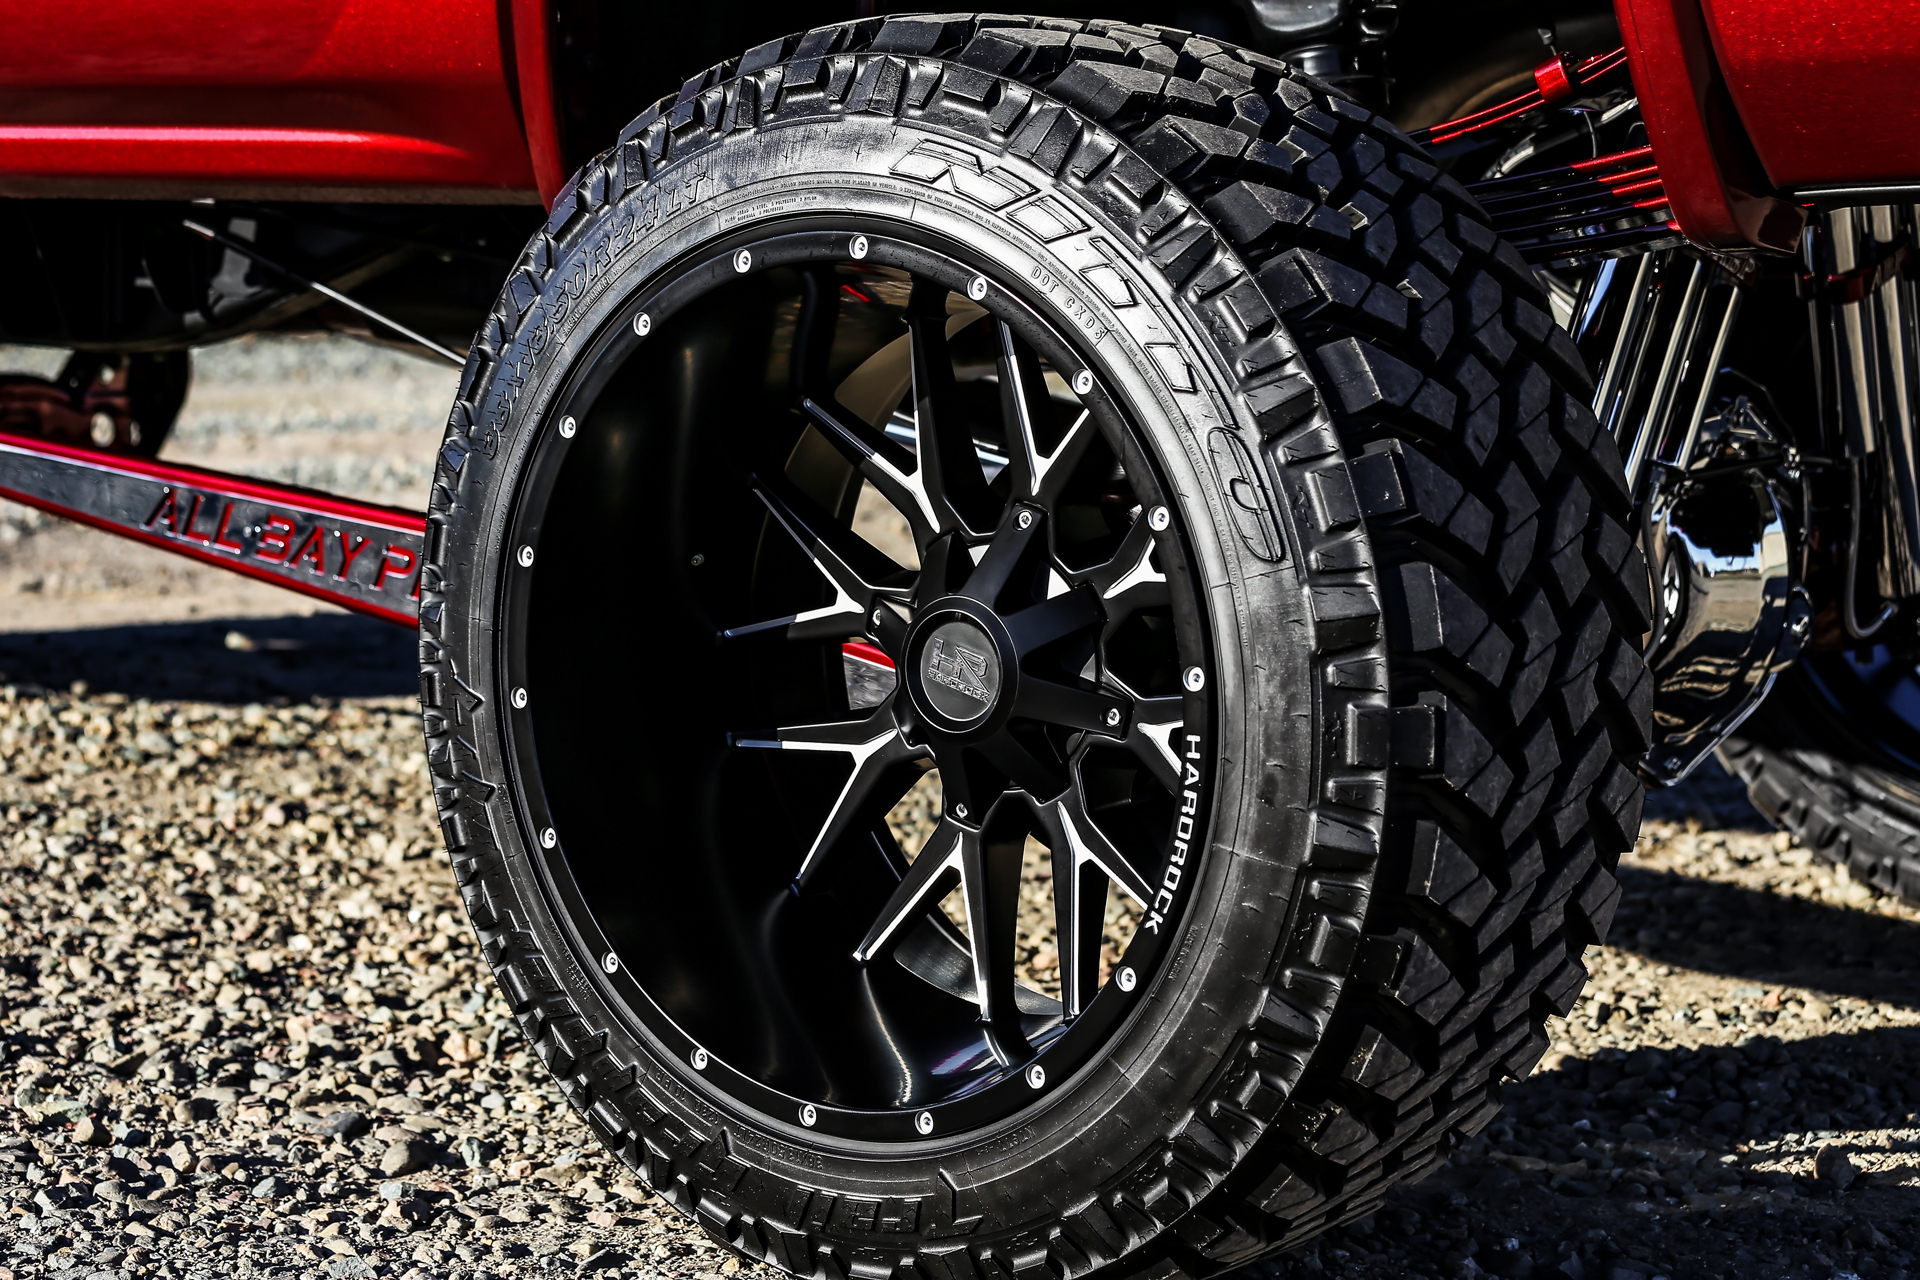 Hardrock 24x14 Affliction Wheels on a Red GMC Sierra Denali